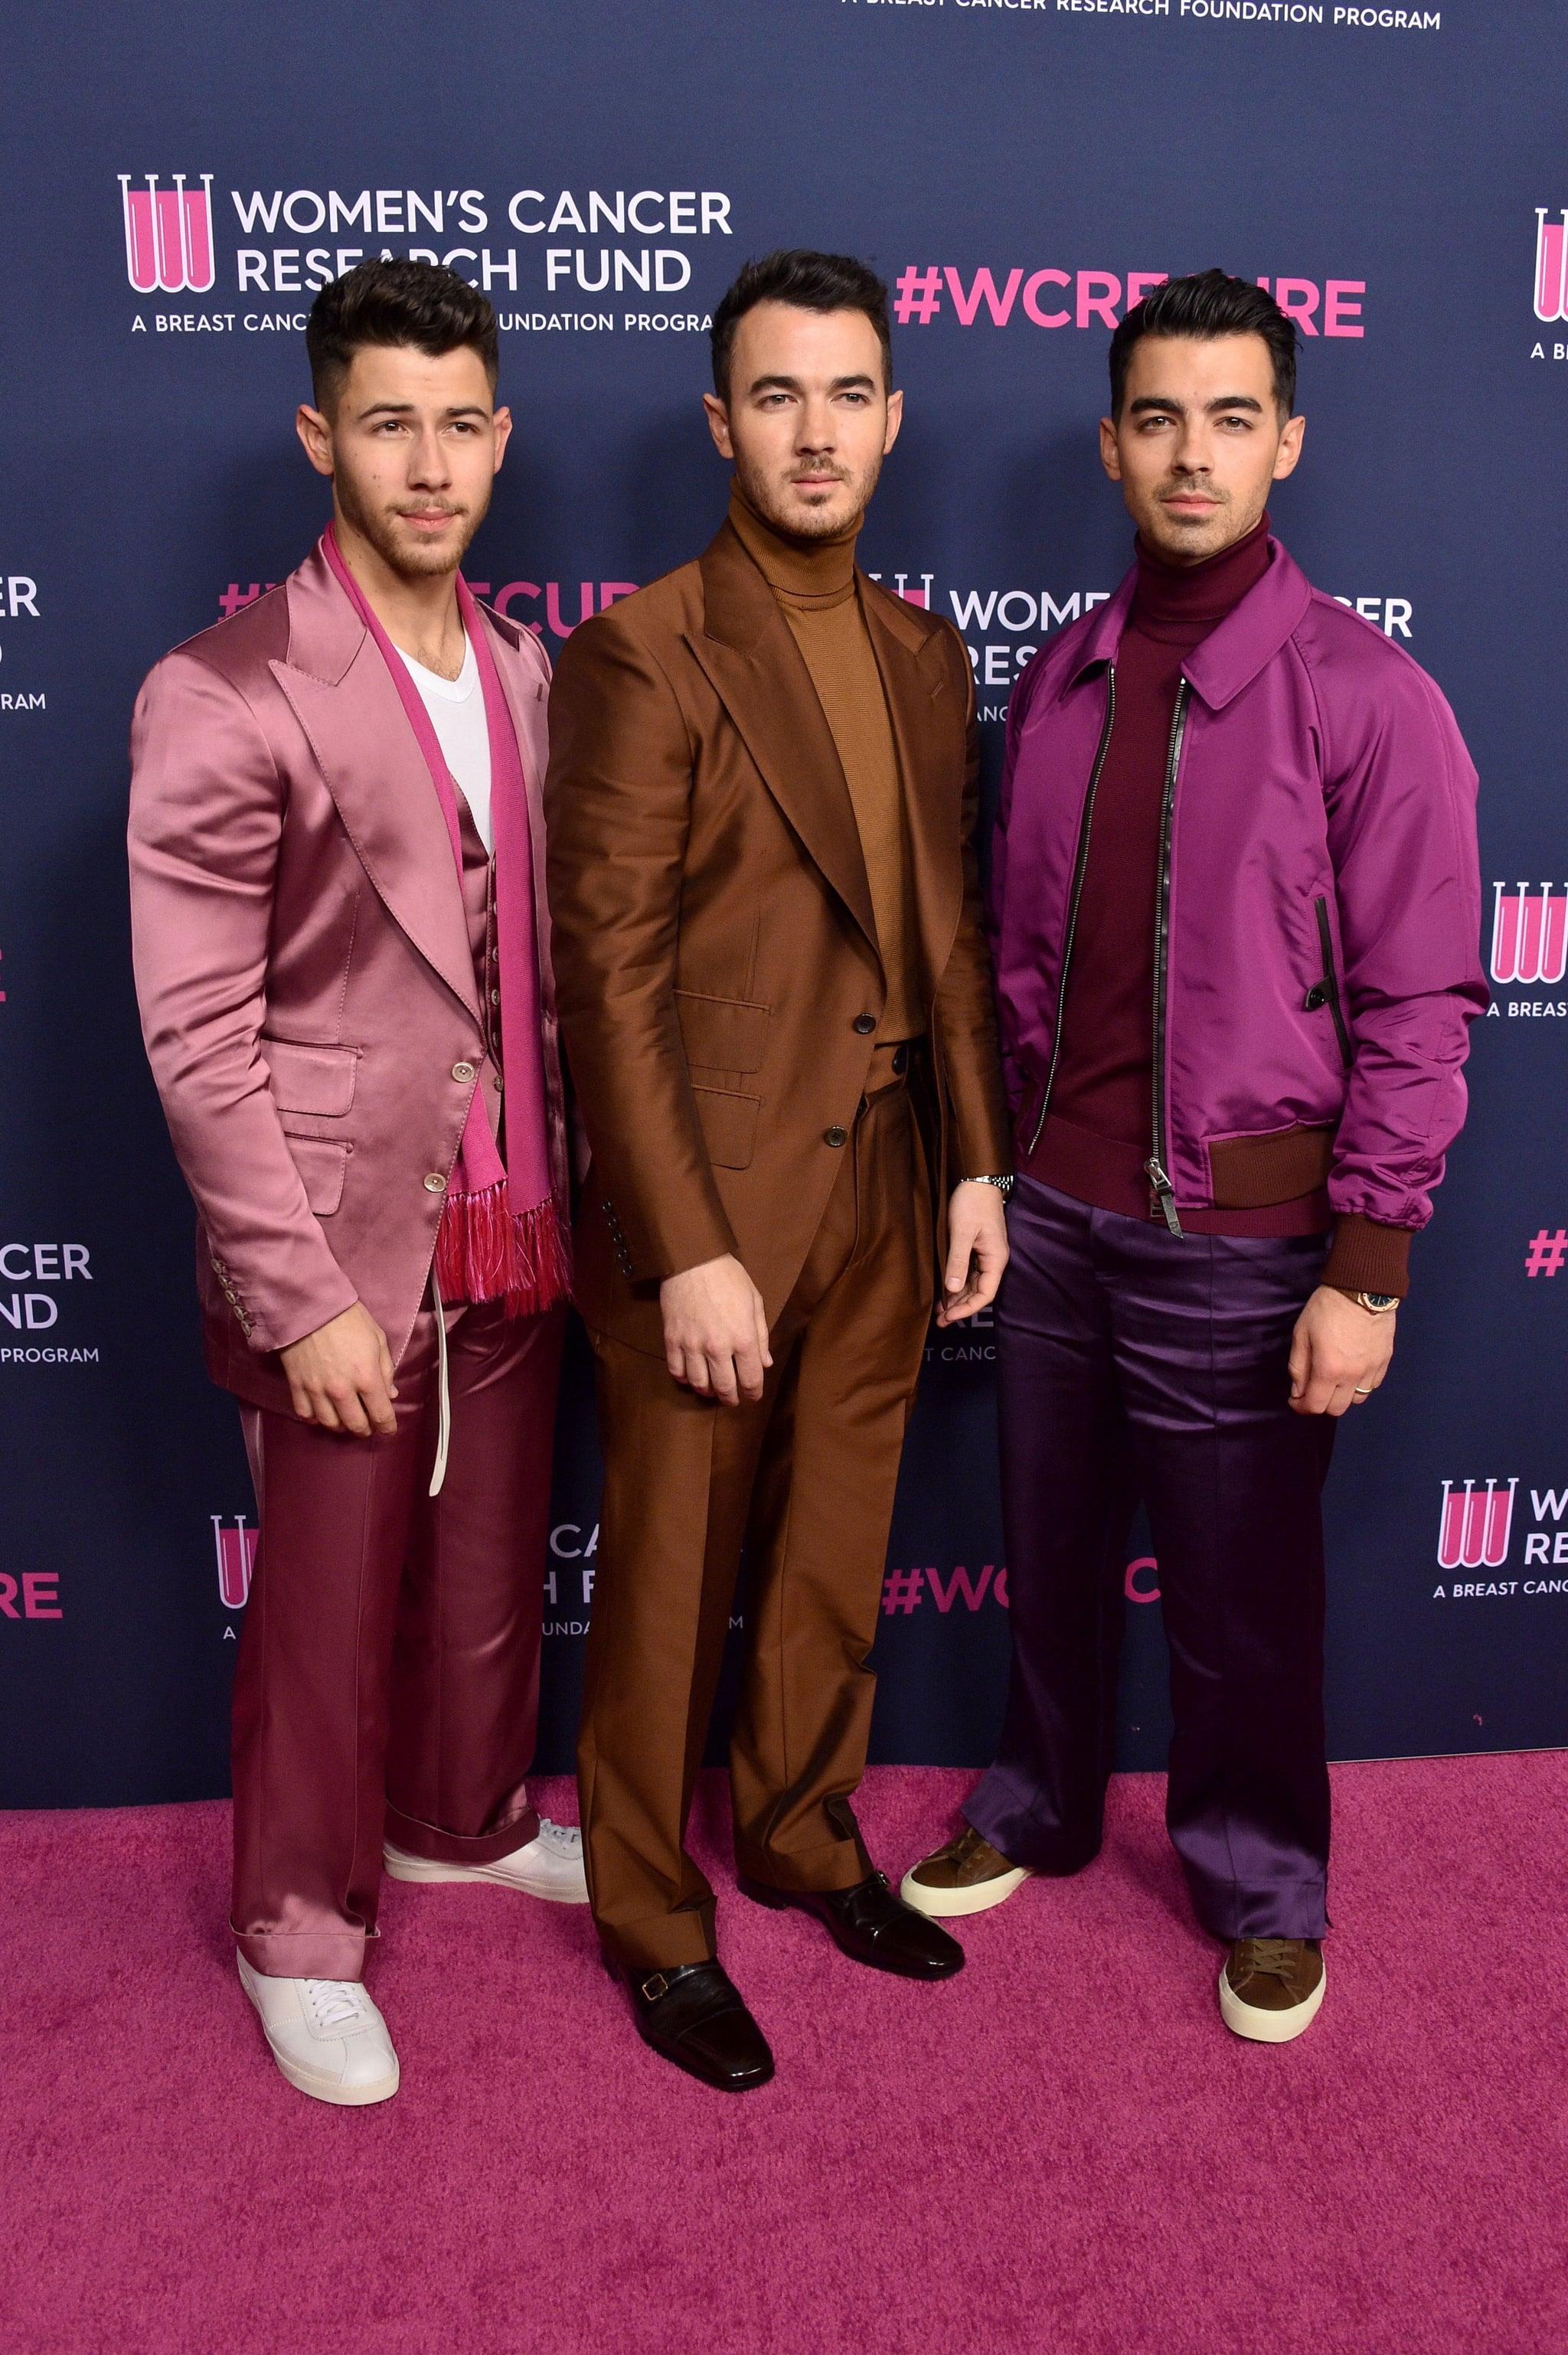 BEVERLY HILLS, CALIFORNIA - FEBRUARY 27: (L-R) Nick Jonas, Kevin Jonas, and Joe Jonas of The Jonas Brothers attend WCRF's